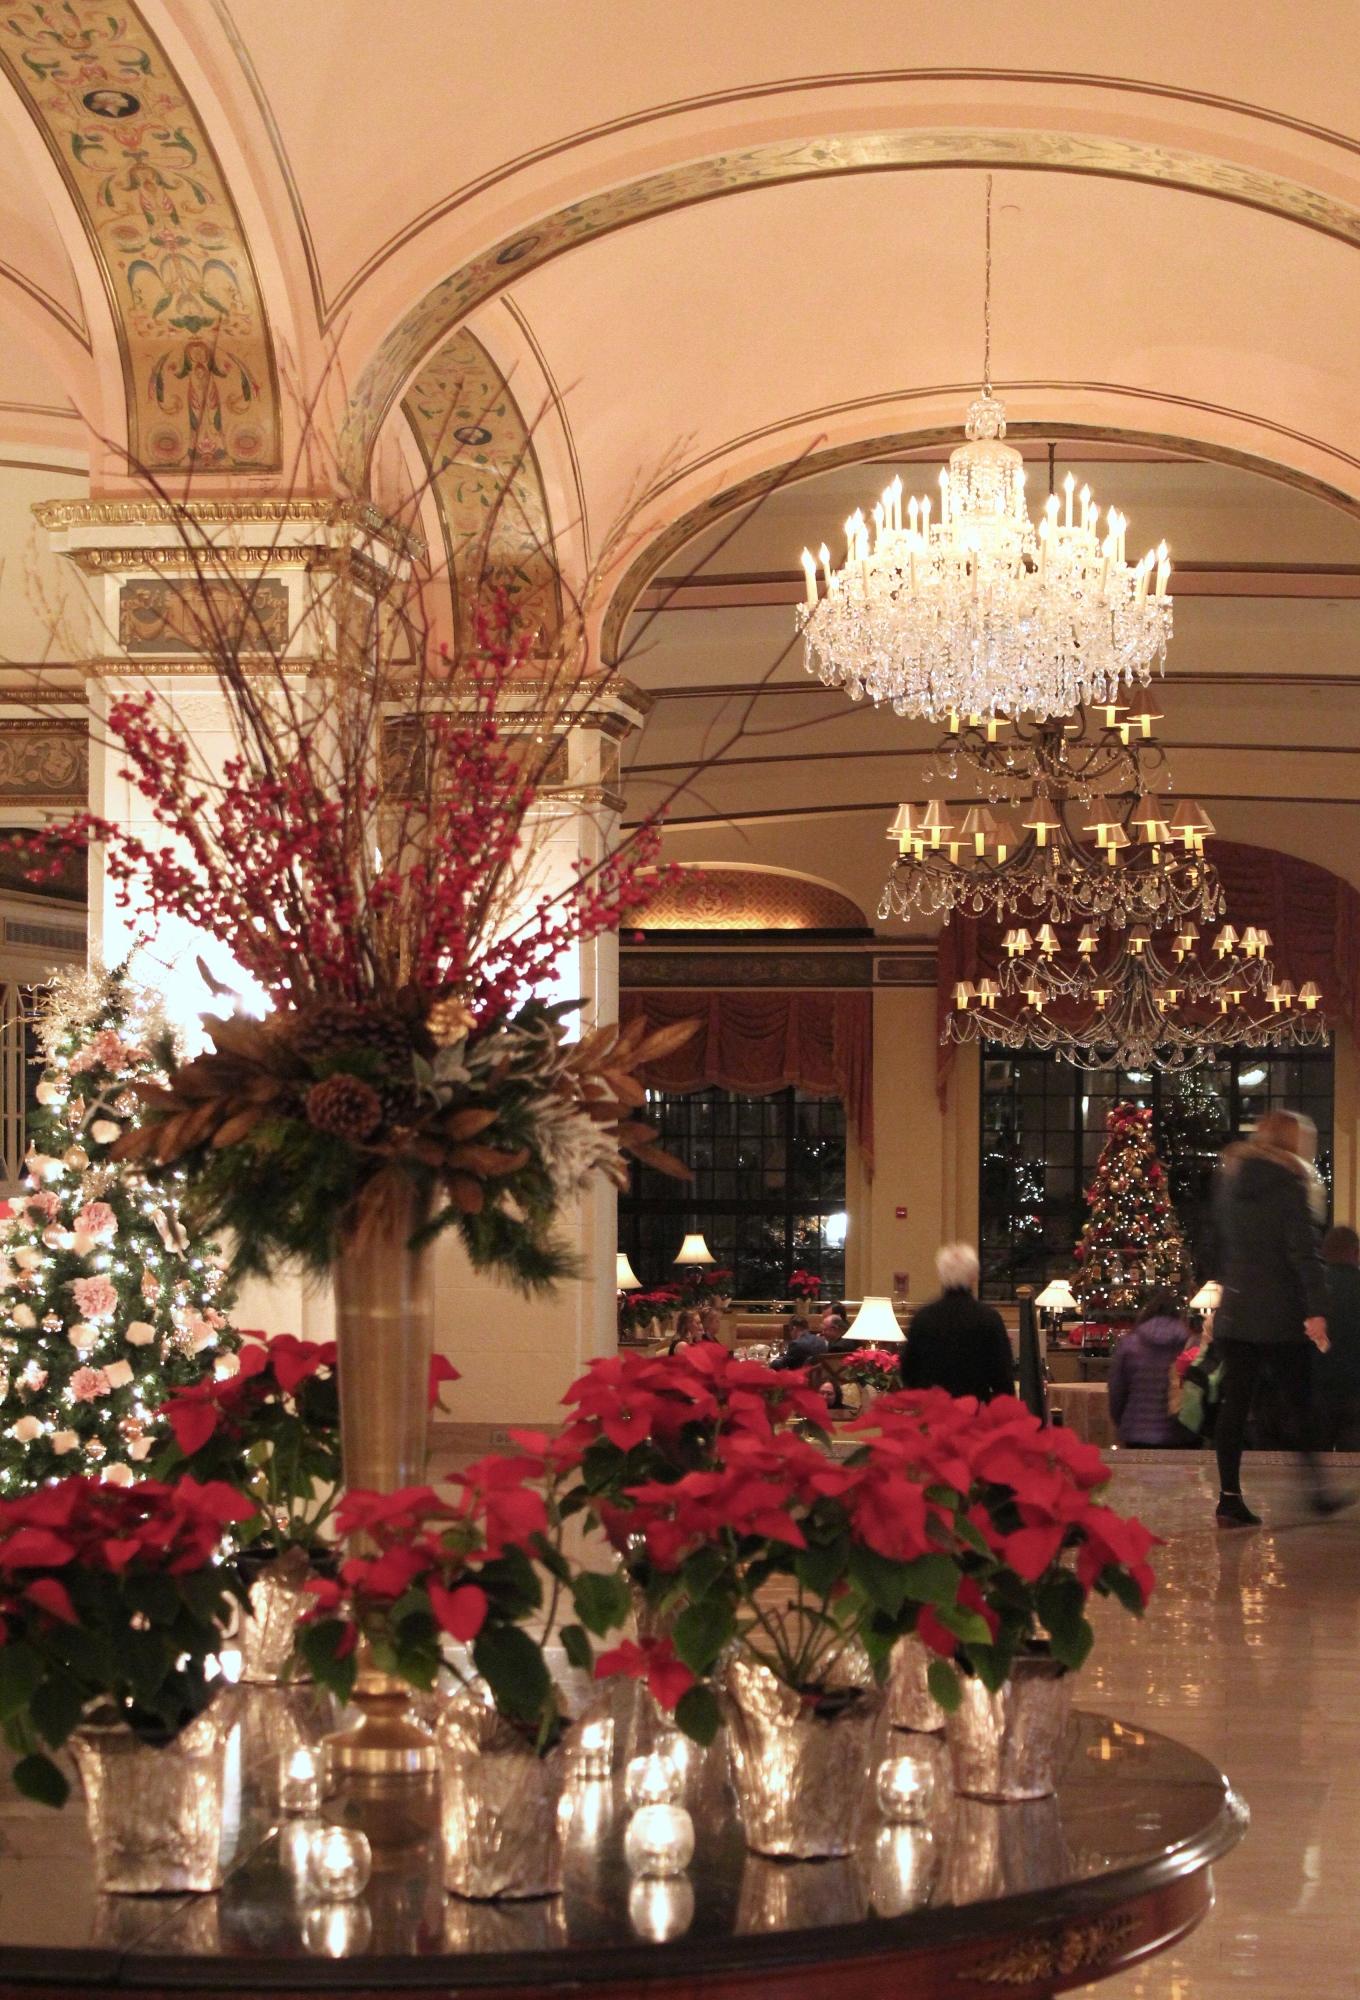 Holiday Decor at Omni Shoreham Hotel